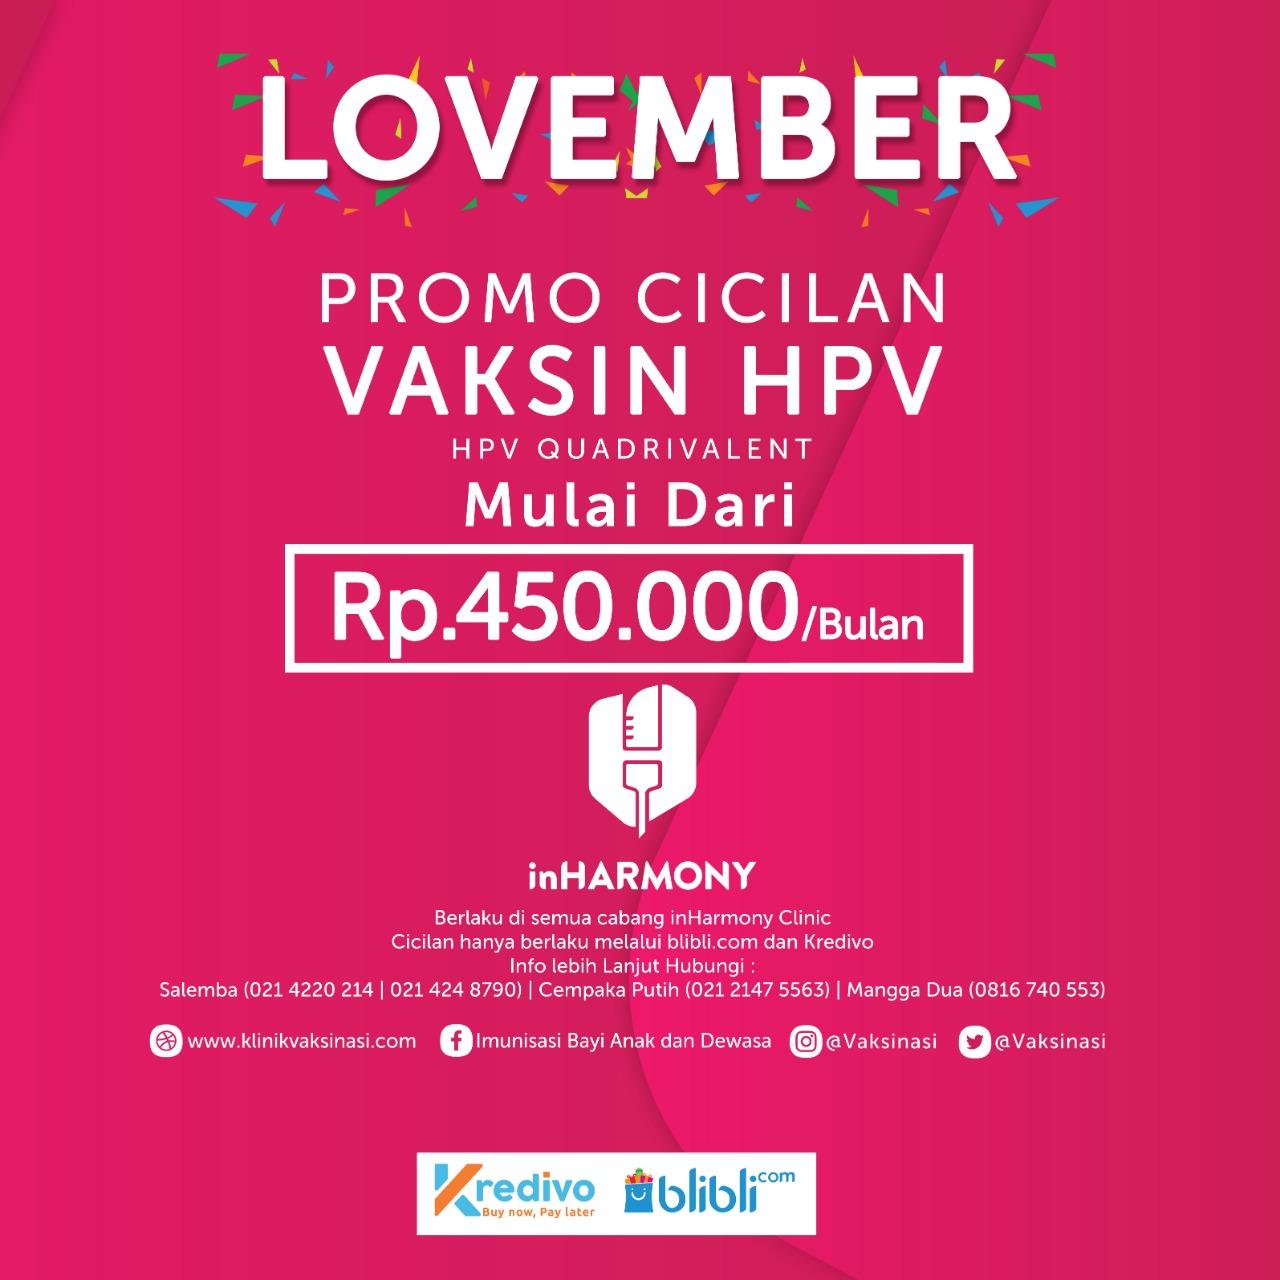 Promo Cicil Vaksin Kanker Serviks November 2019 – Lovember